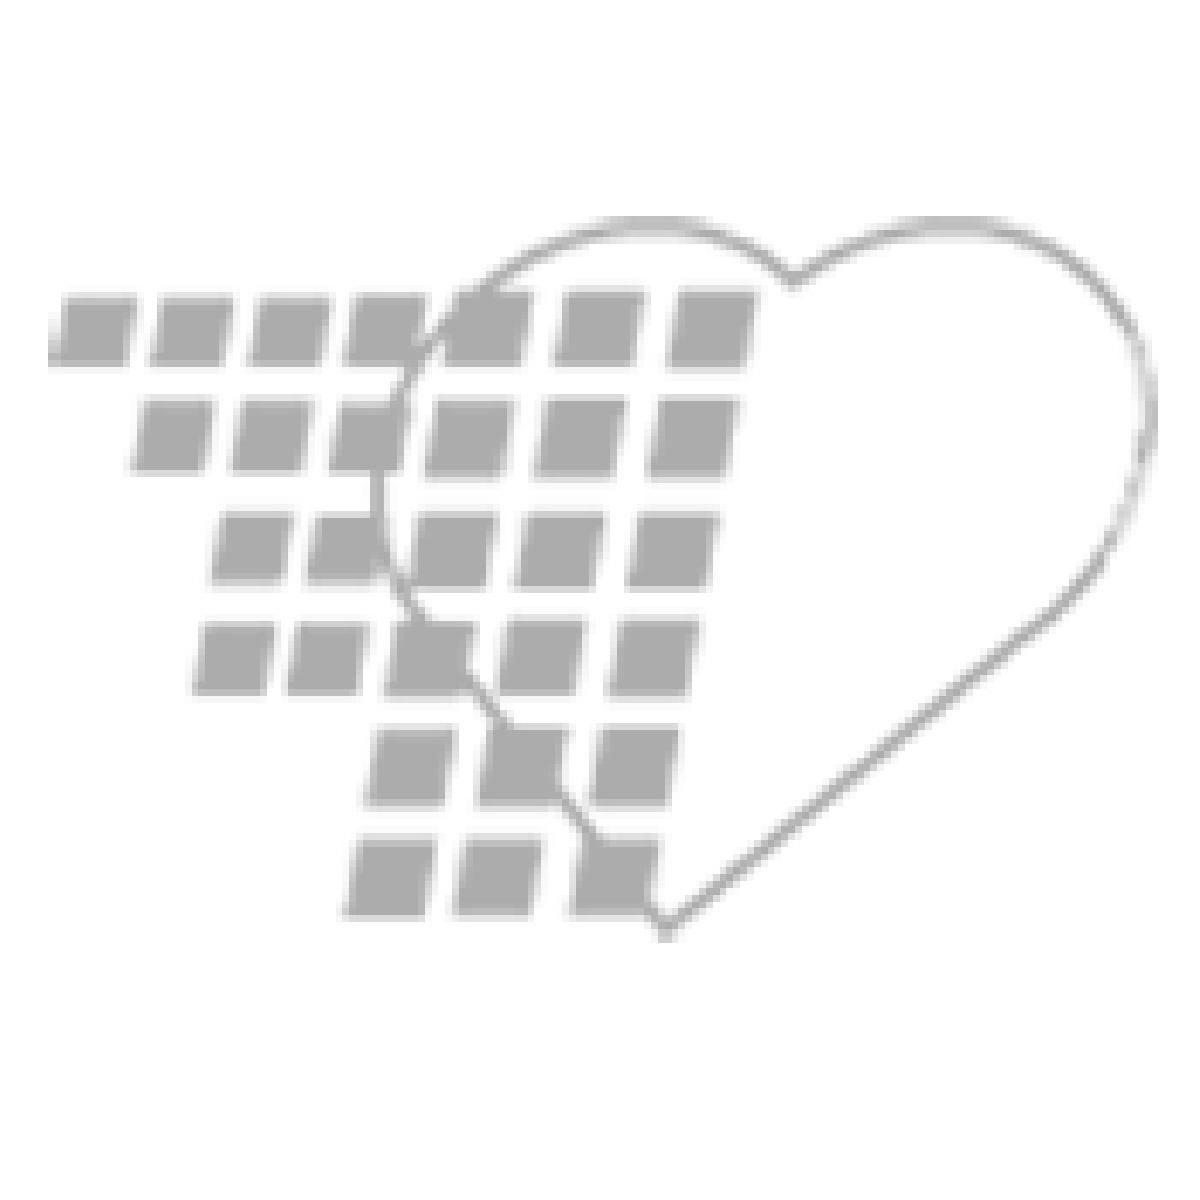 06-93-0053 - Demo Dose® CloZAPin (Clorazl) 25 mg tables UD- 100 Pills/Box